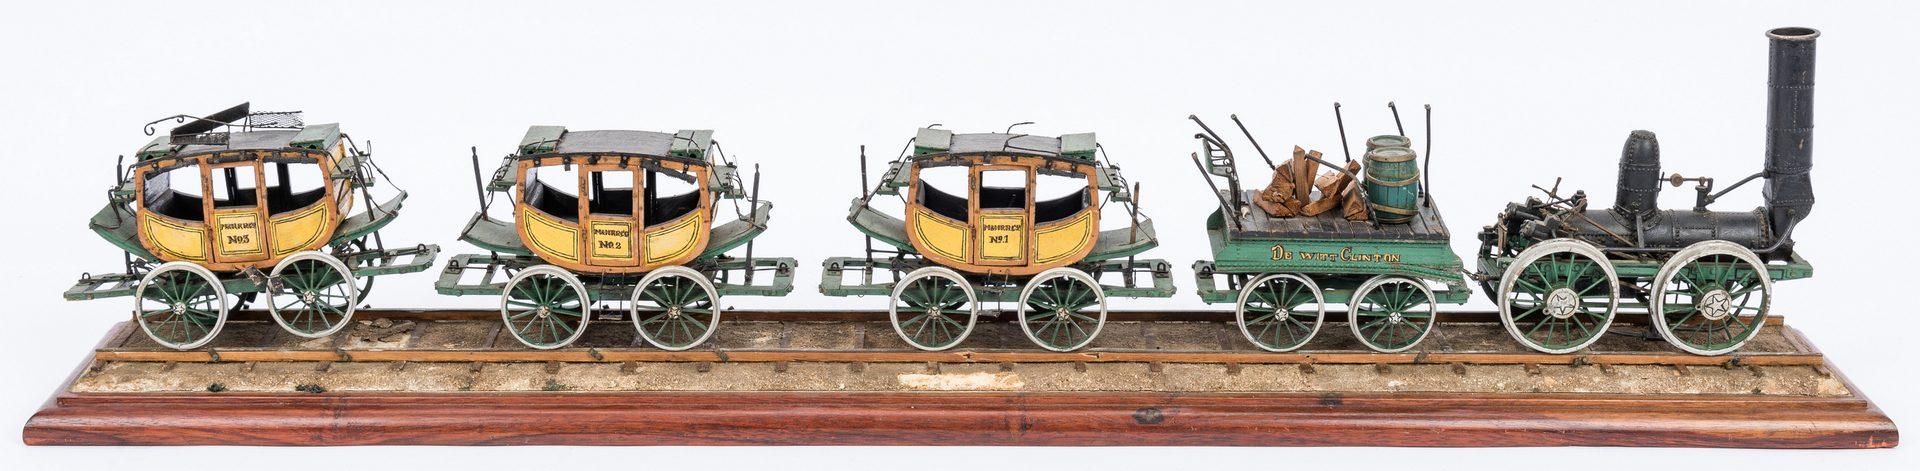 Lot 379: Mechanical Scale Model Dewitt Clinton Passenger Train